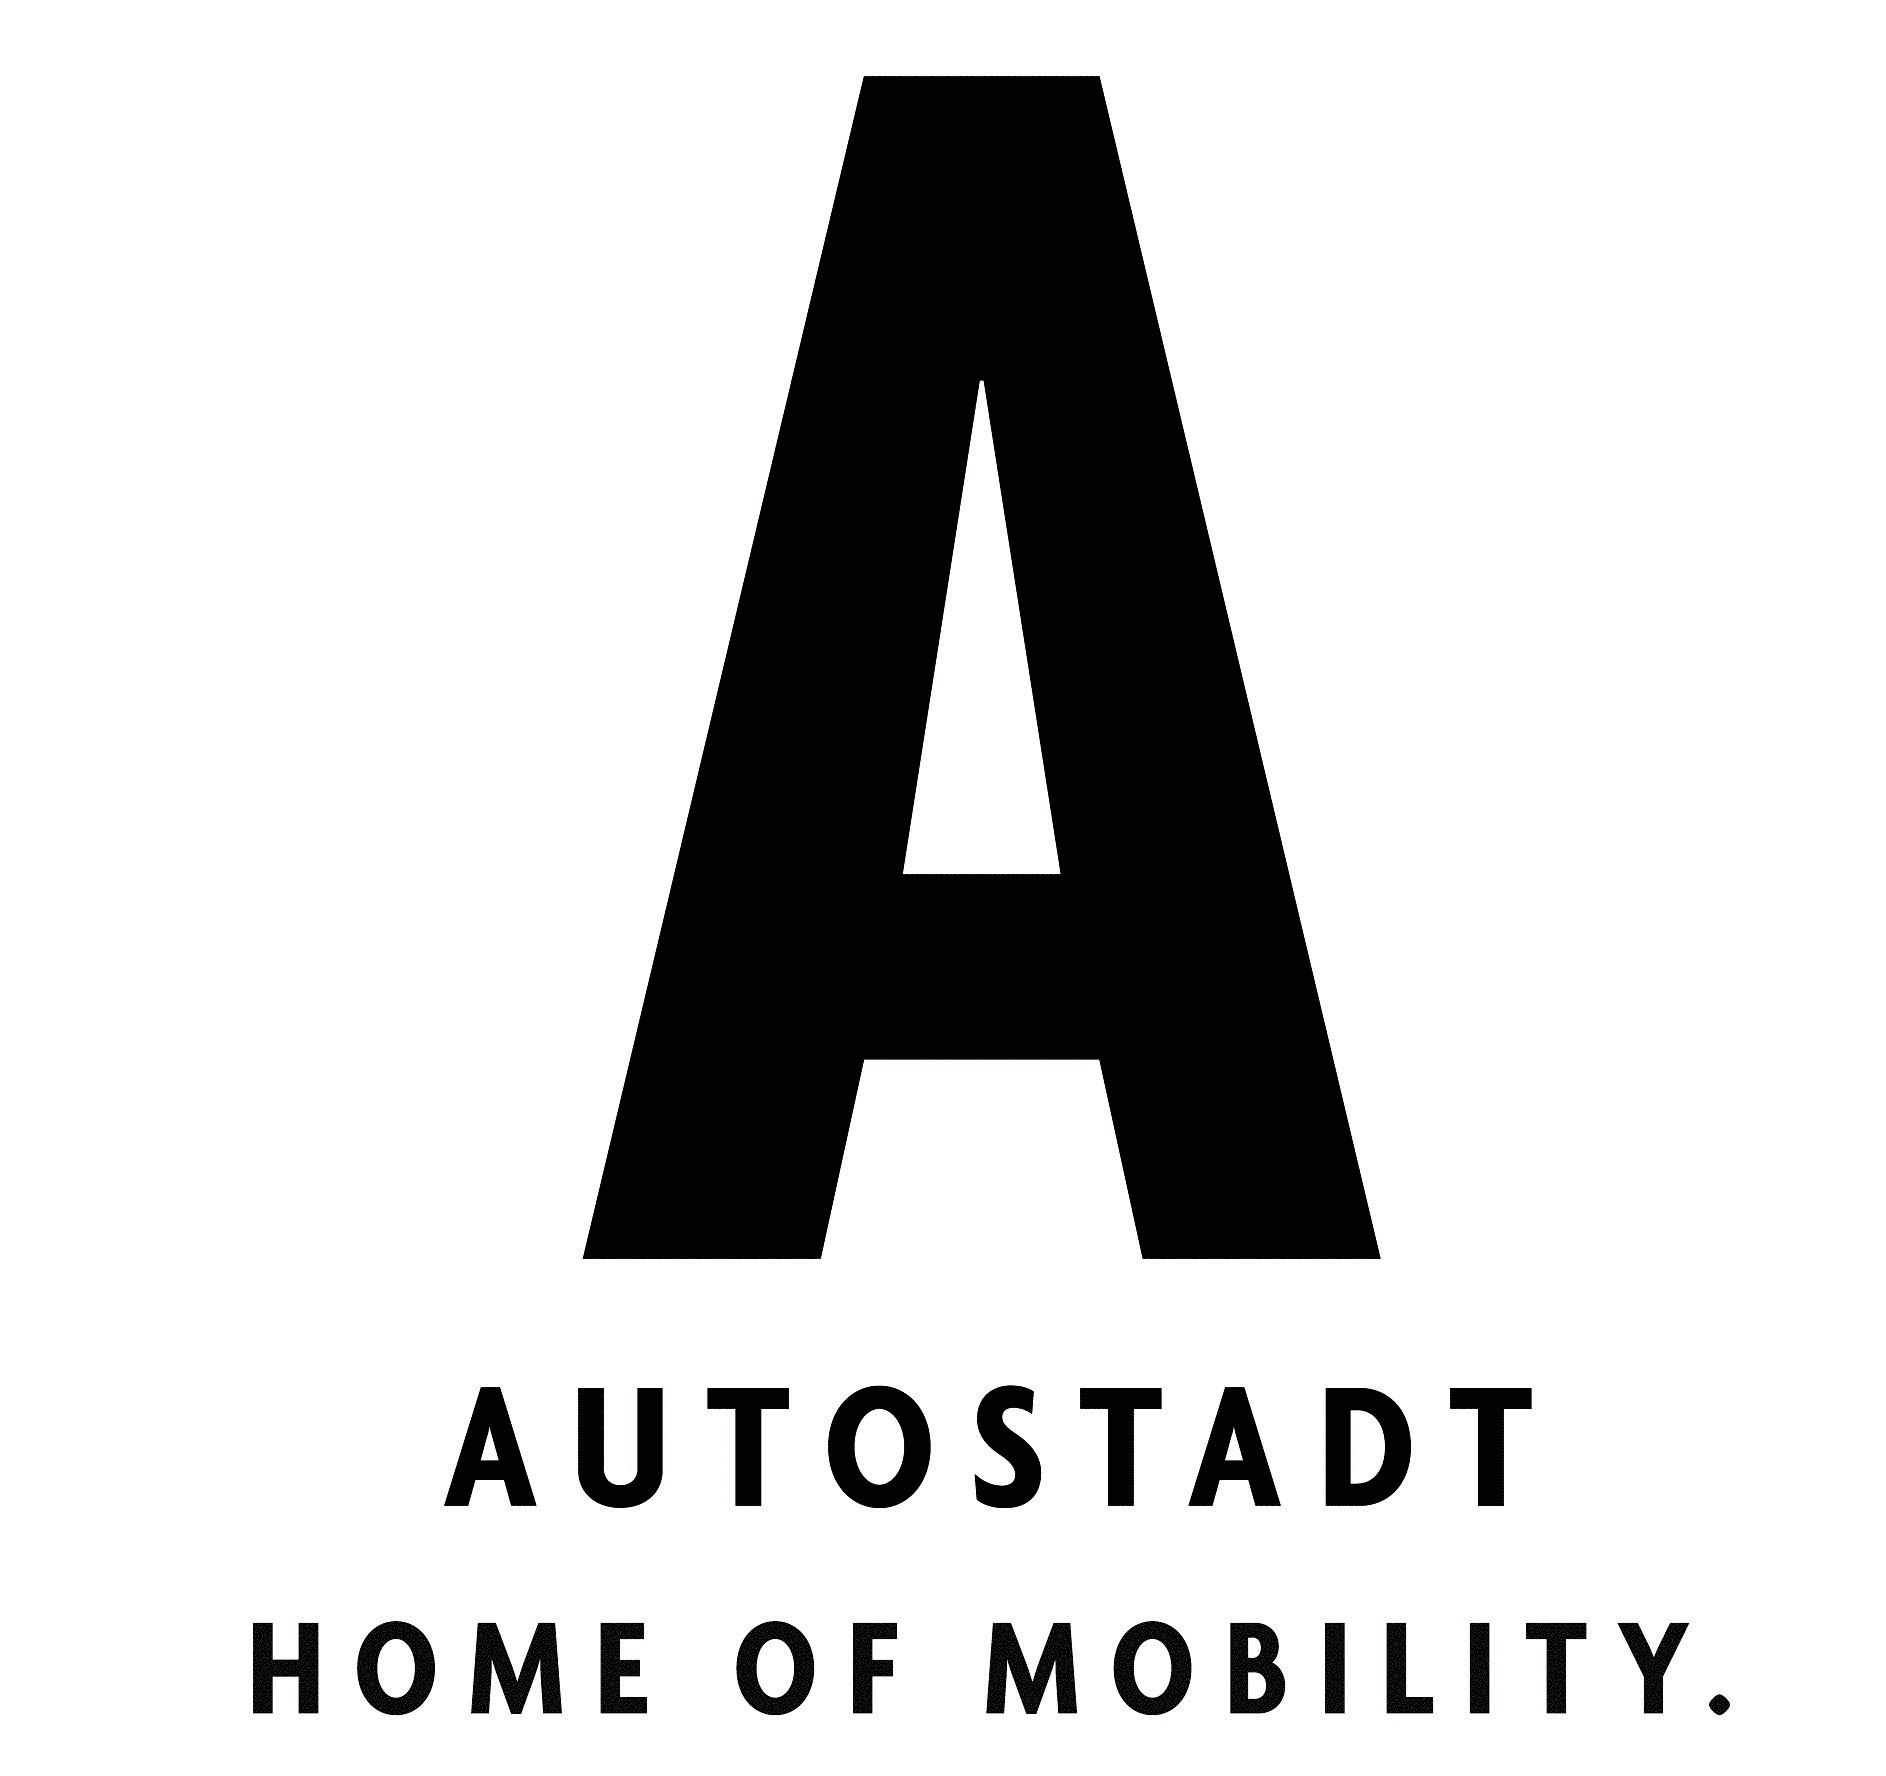 Bildmarke: A AUTOSTADT HOME OF MOBILITY.